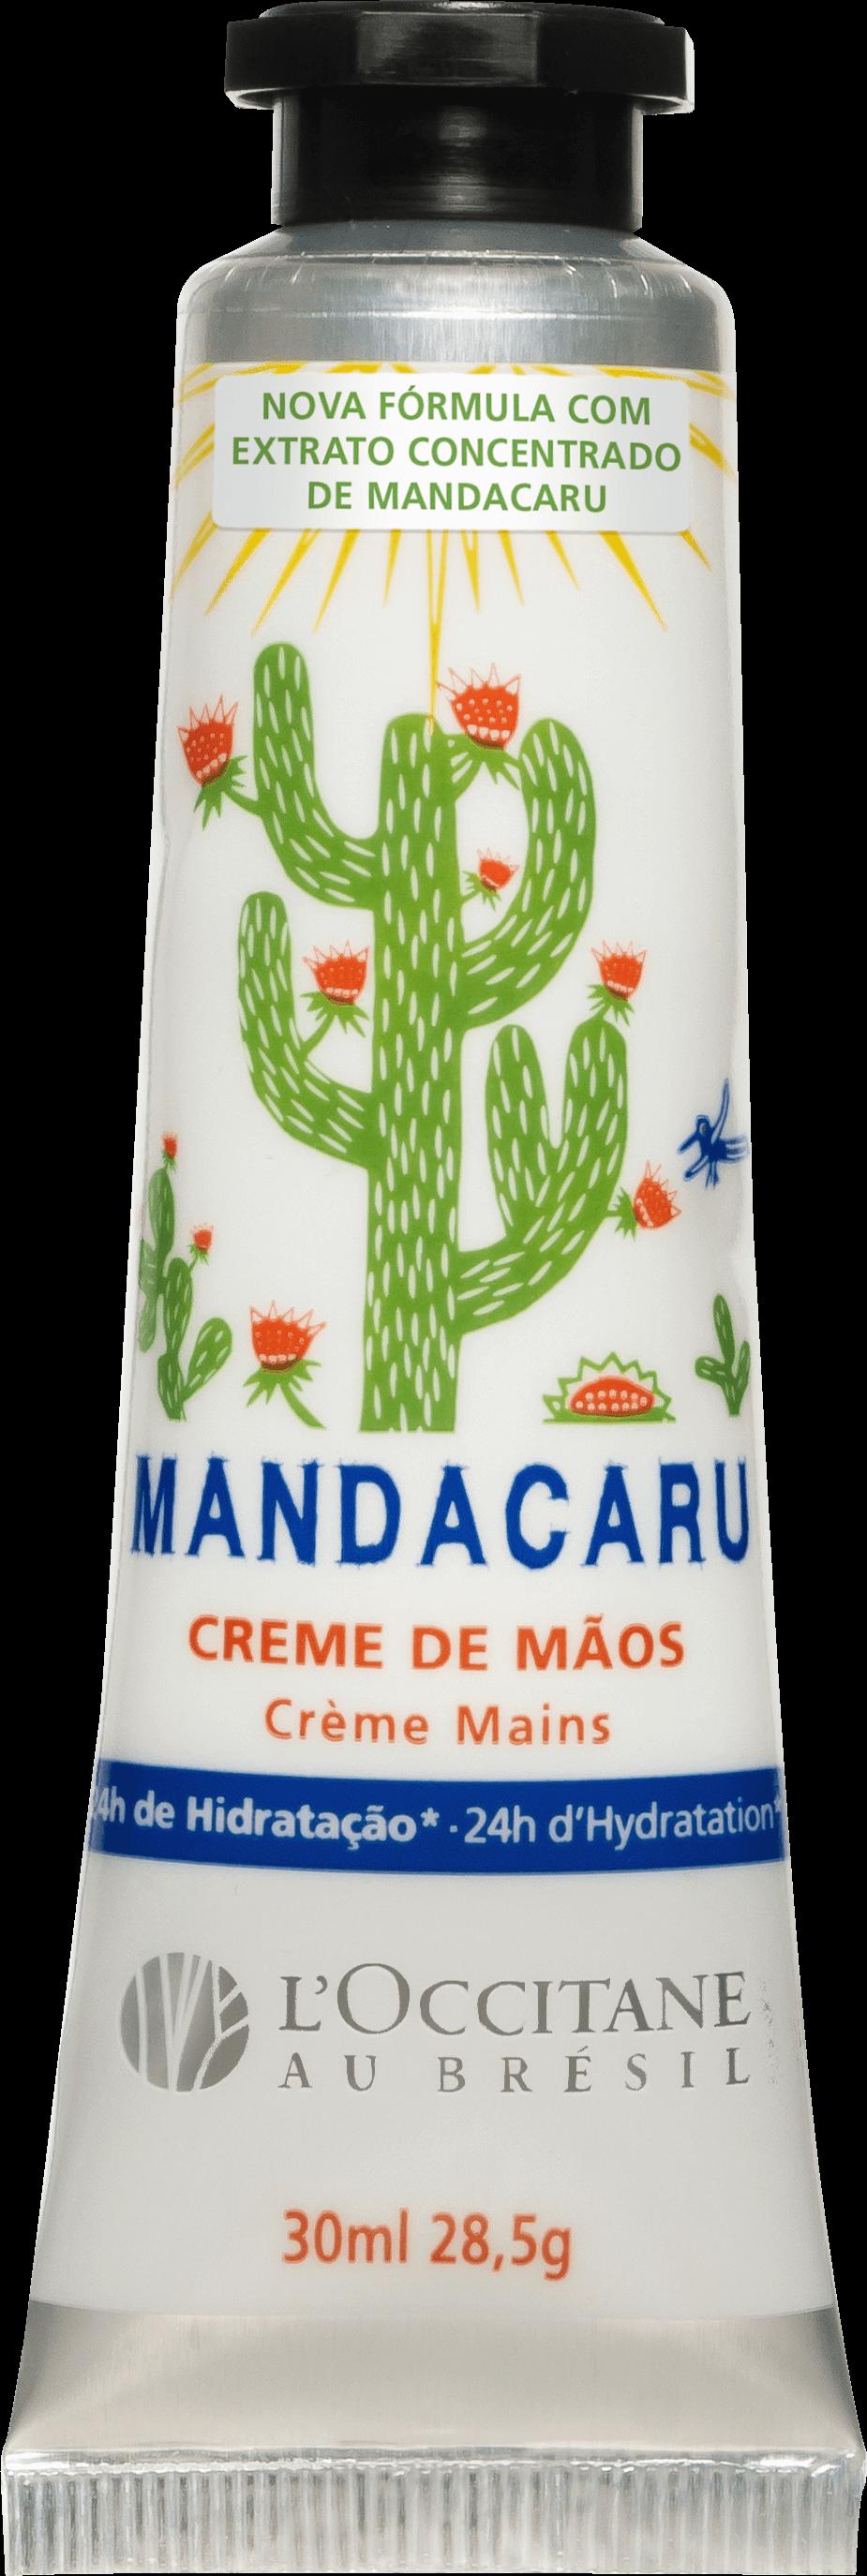 Creme De Mãos Mandacaru, L'Occitane au Brésil - 30 ml